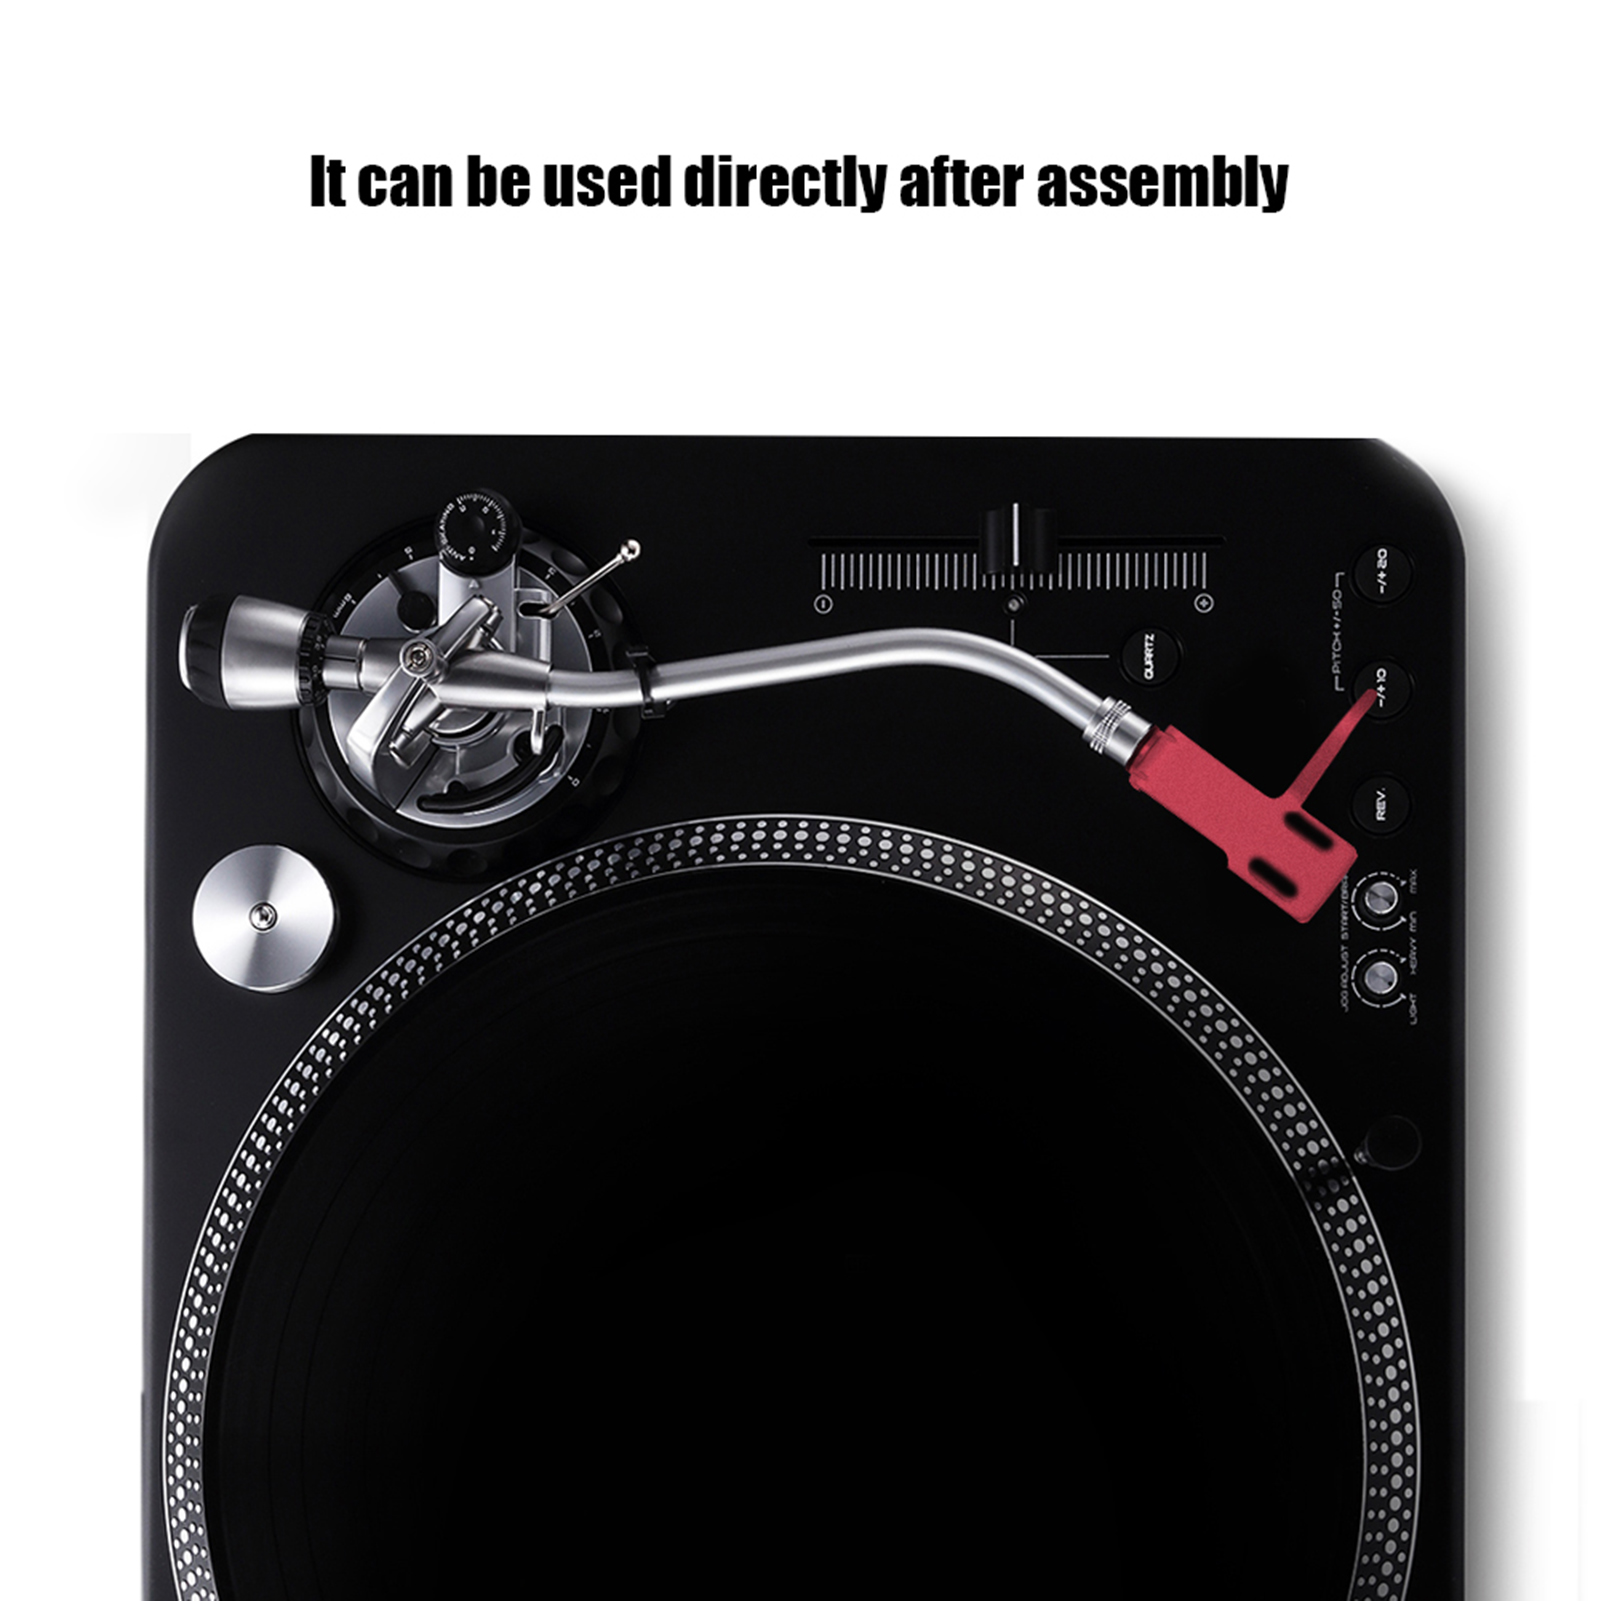 Universal-Phono-Stylus-Holder-Headshell-Cartridge-Keeper-for-LP-Record-Player thumbnail 13